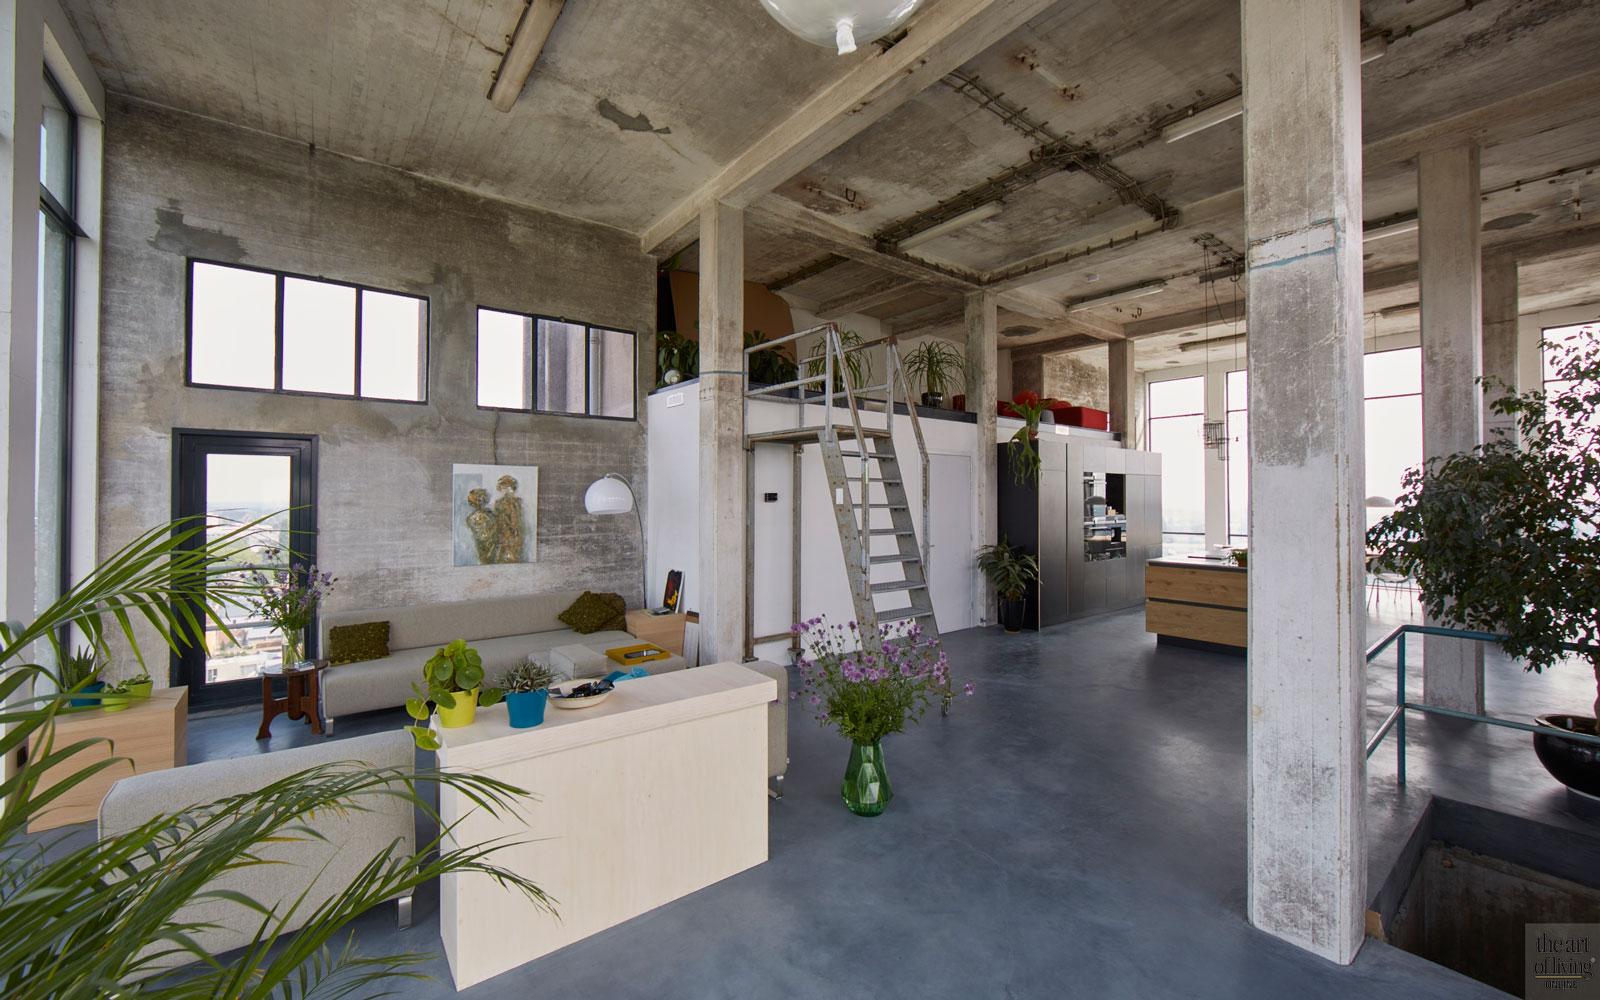 Woonkamer Met Beton : Betonvloer woonkamer betonvloer in huis standaard beton design